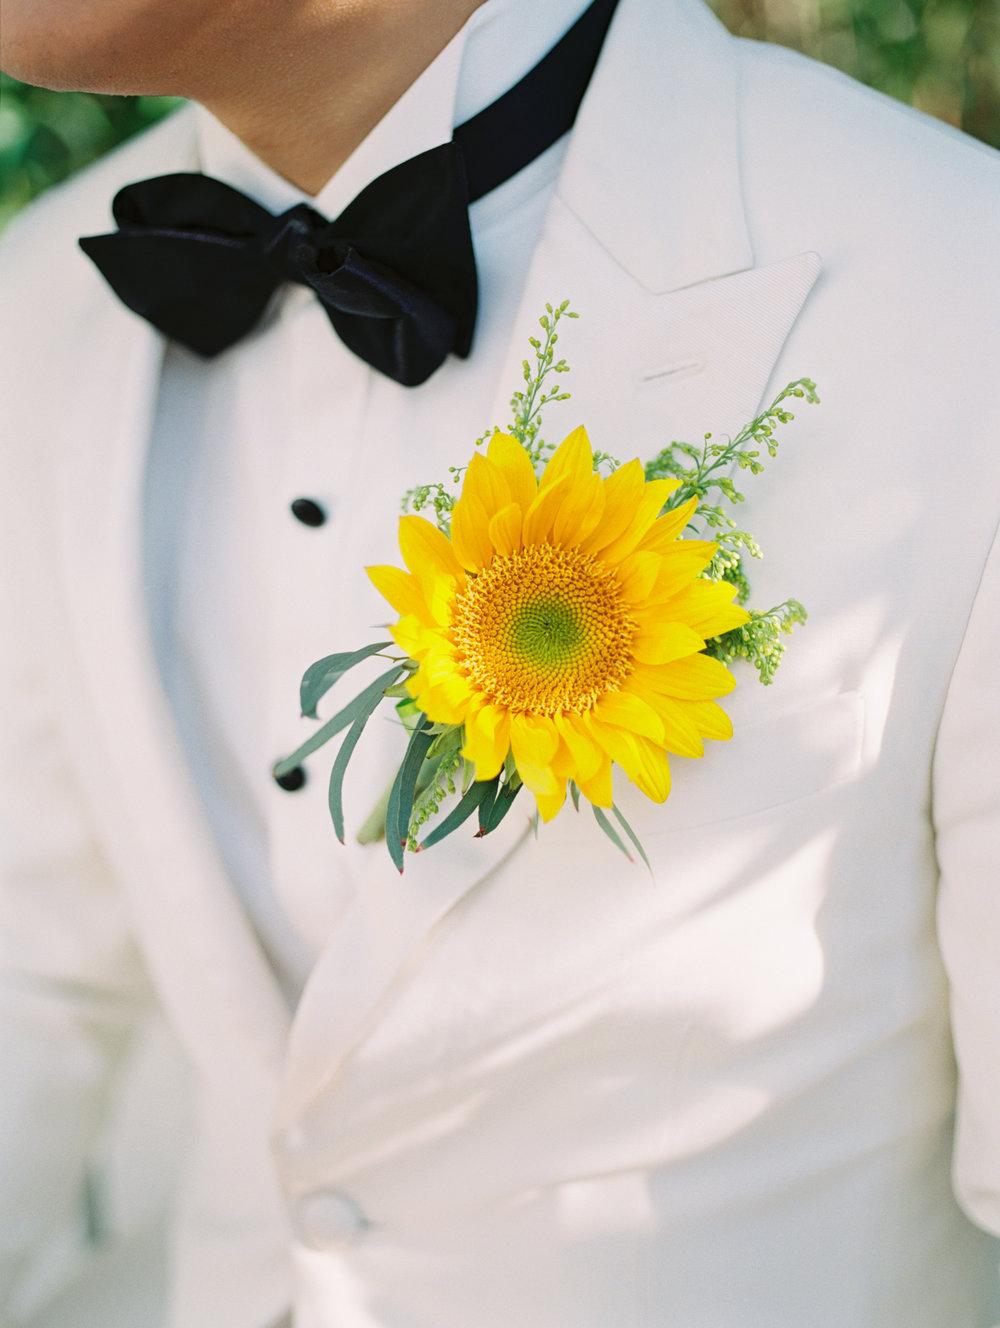 los-angeles-county-arboretum-and-botanic-garden-wedding-photos-photography287.jpg